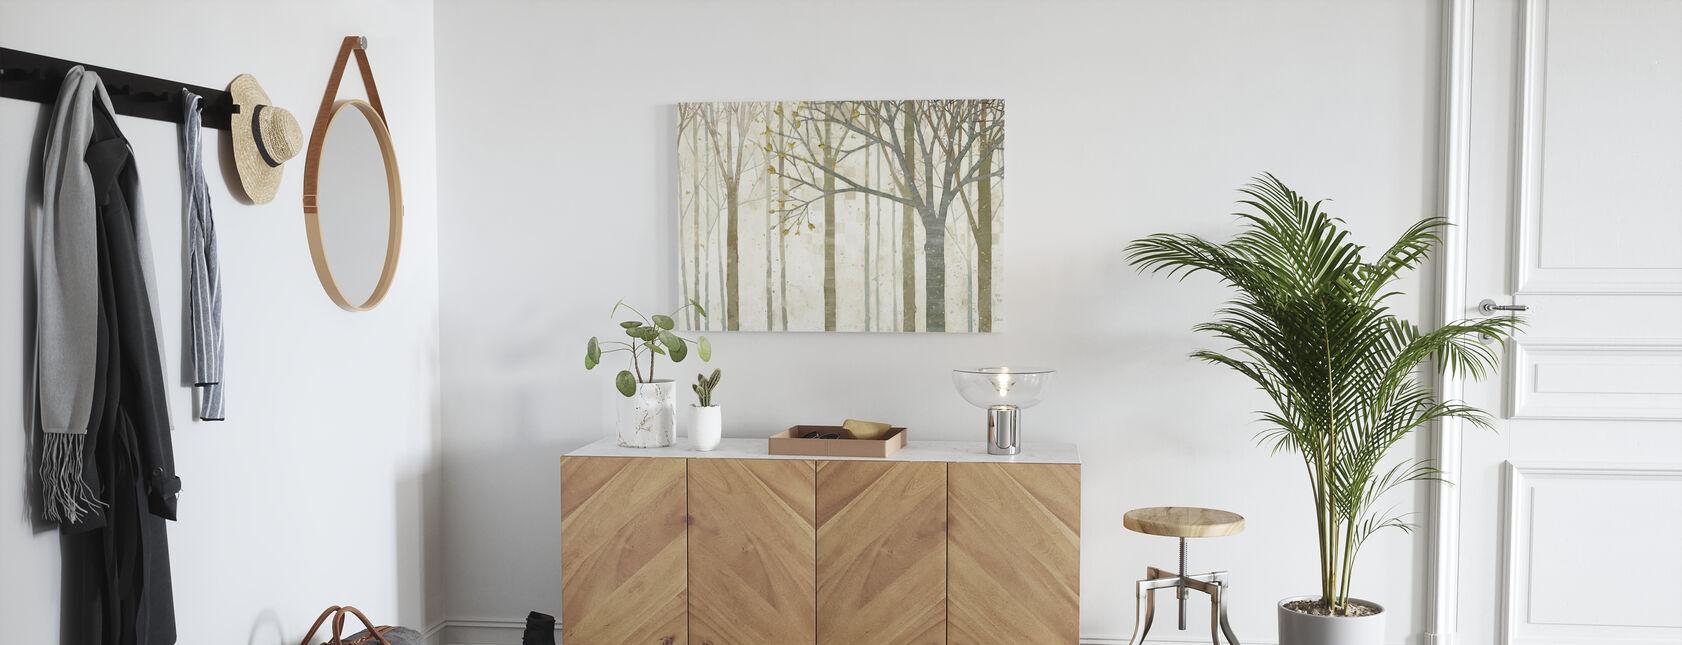 In Springtime - Canvas print - Hallway